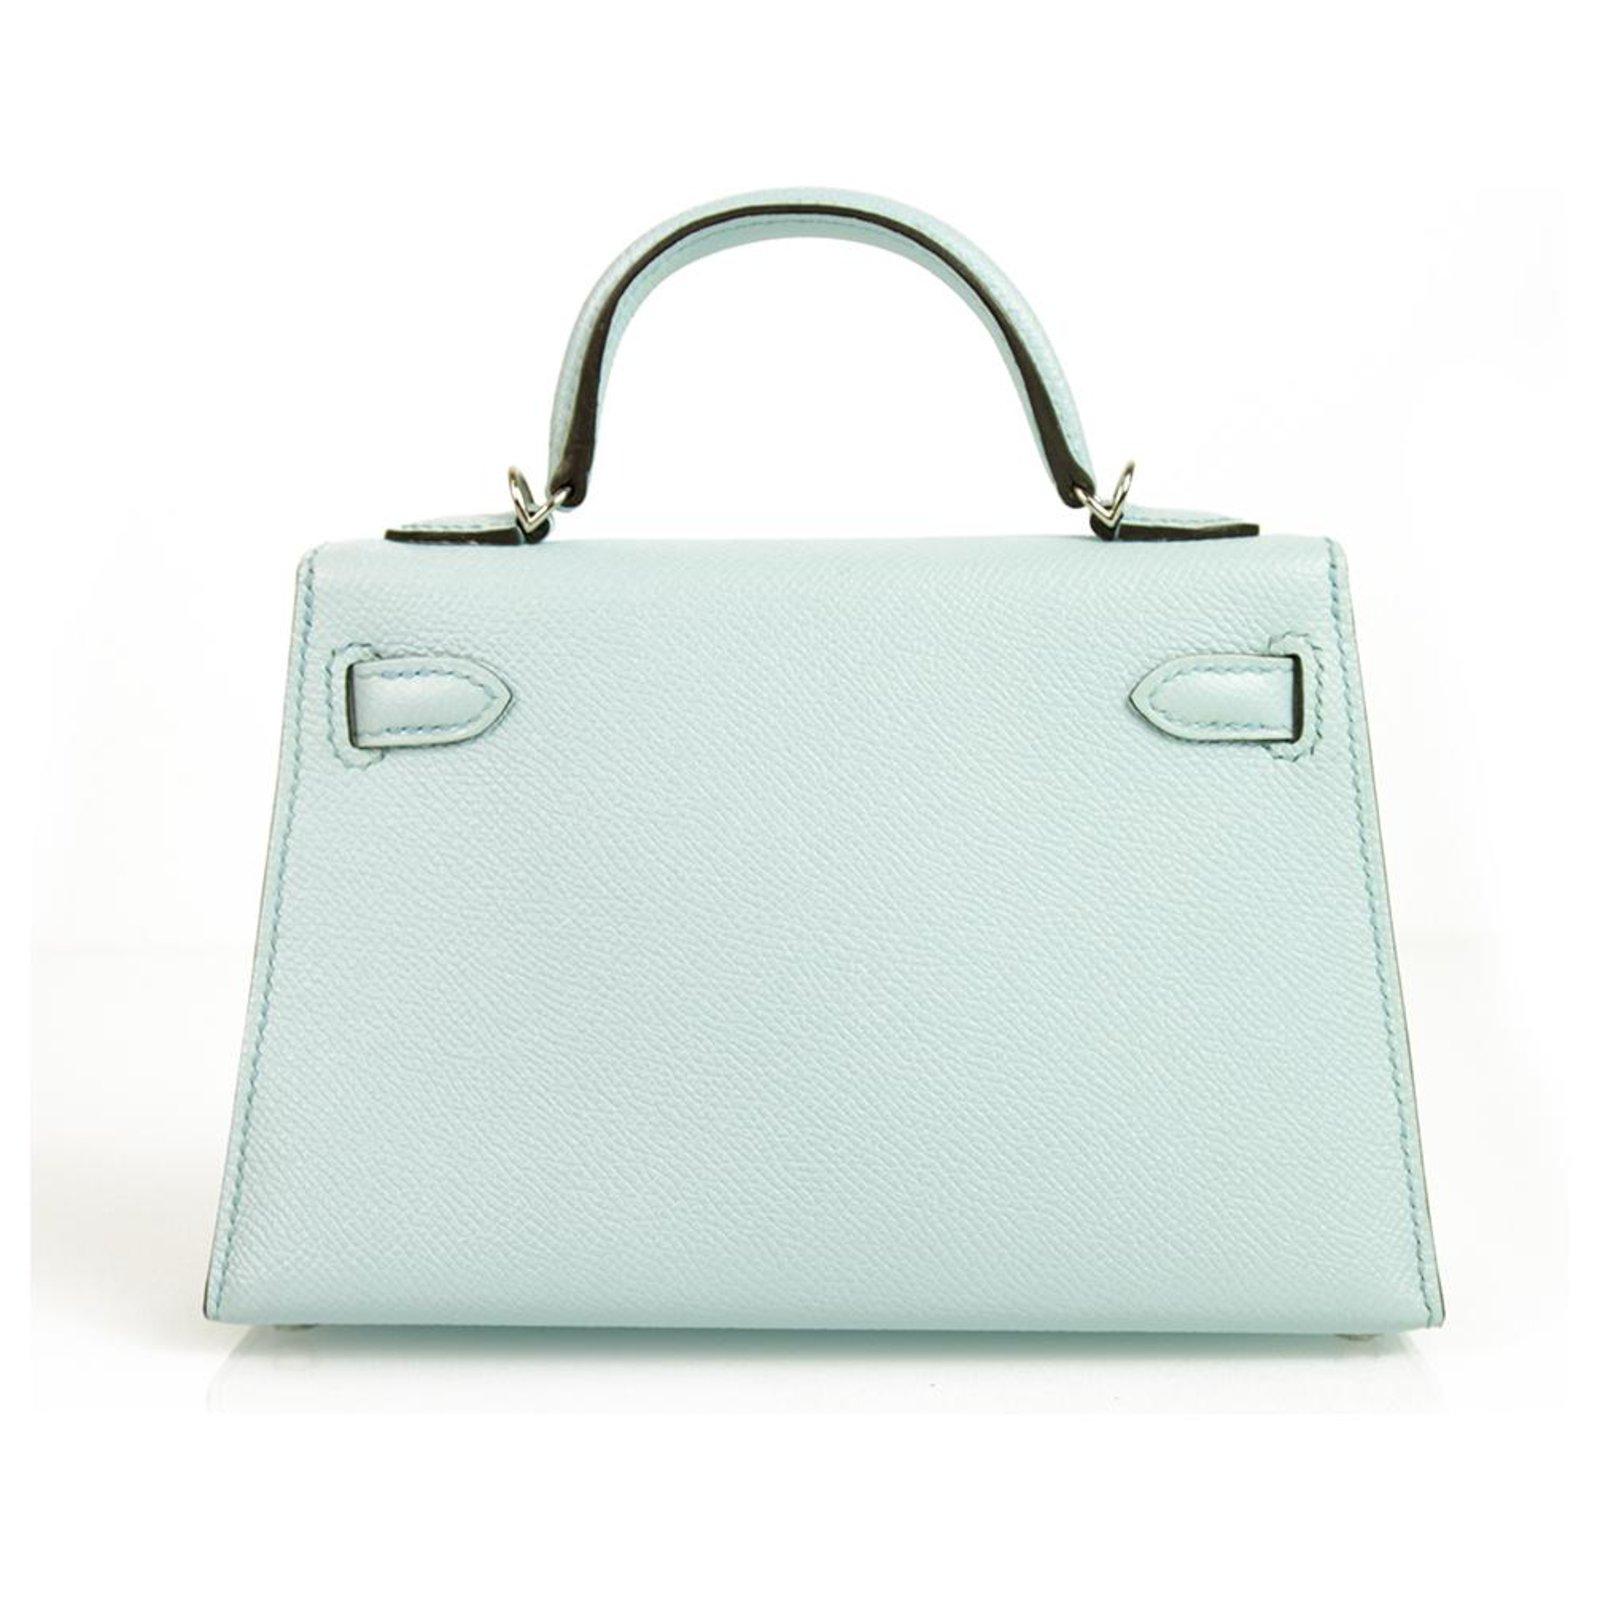 870084c460ea Hermès Hermes Mini Kelly 20 II Blue Zephyr Epsom with Palladium Hardware  mint condition Handbags Leather Light blue ref.125996 - Joli Closet